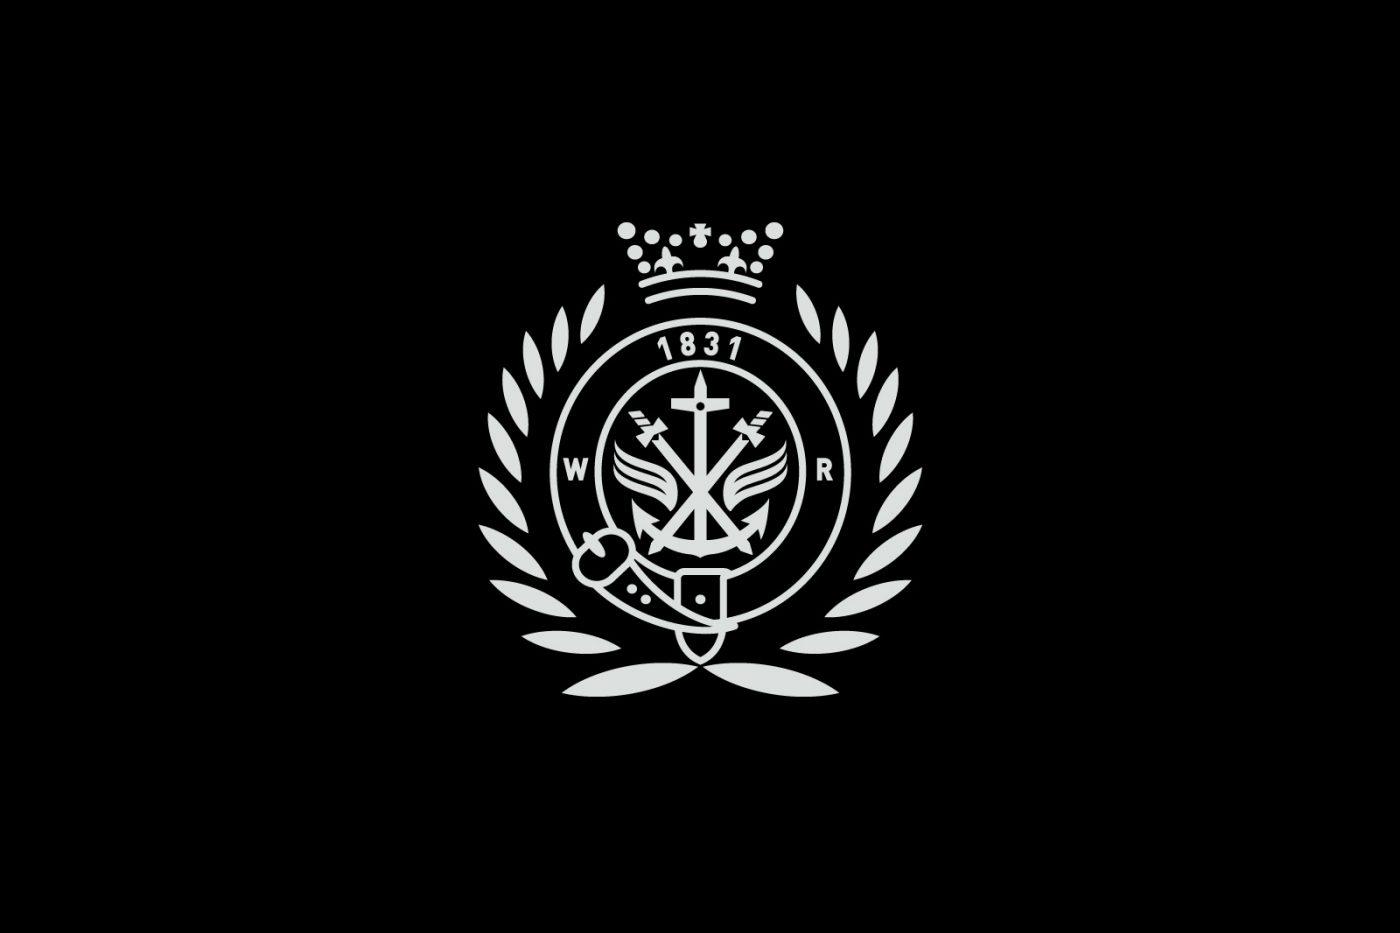 Royal United Service Institute